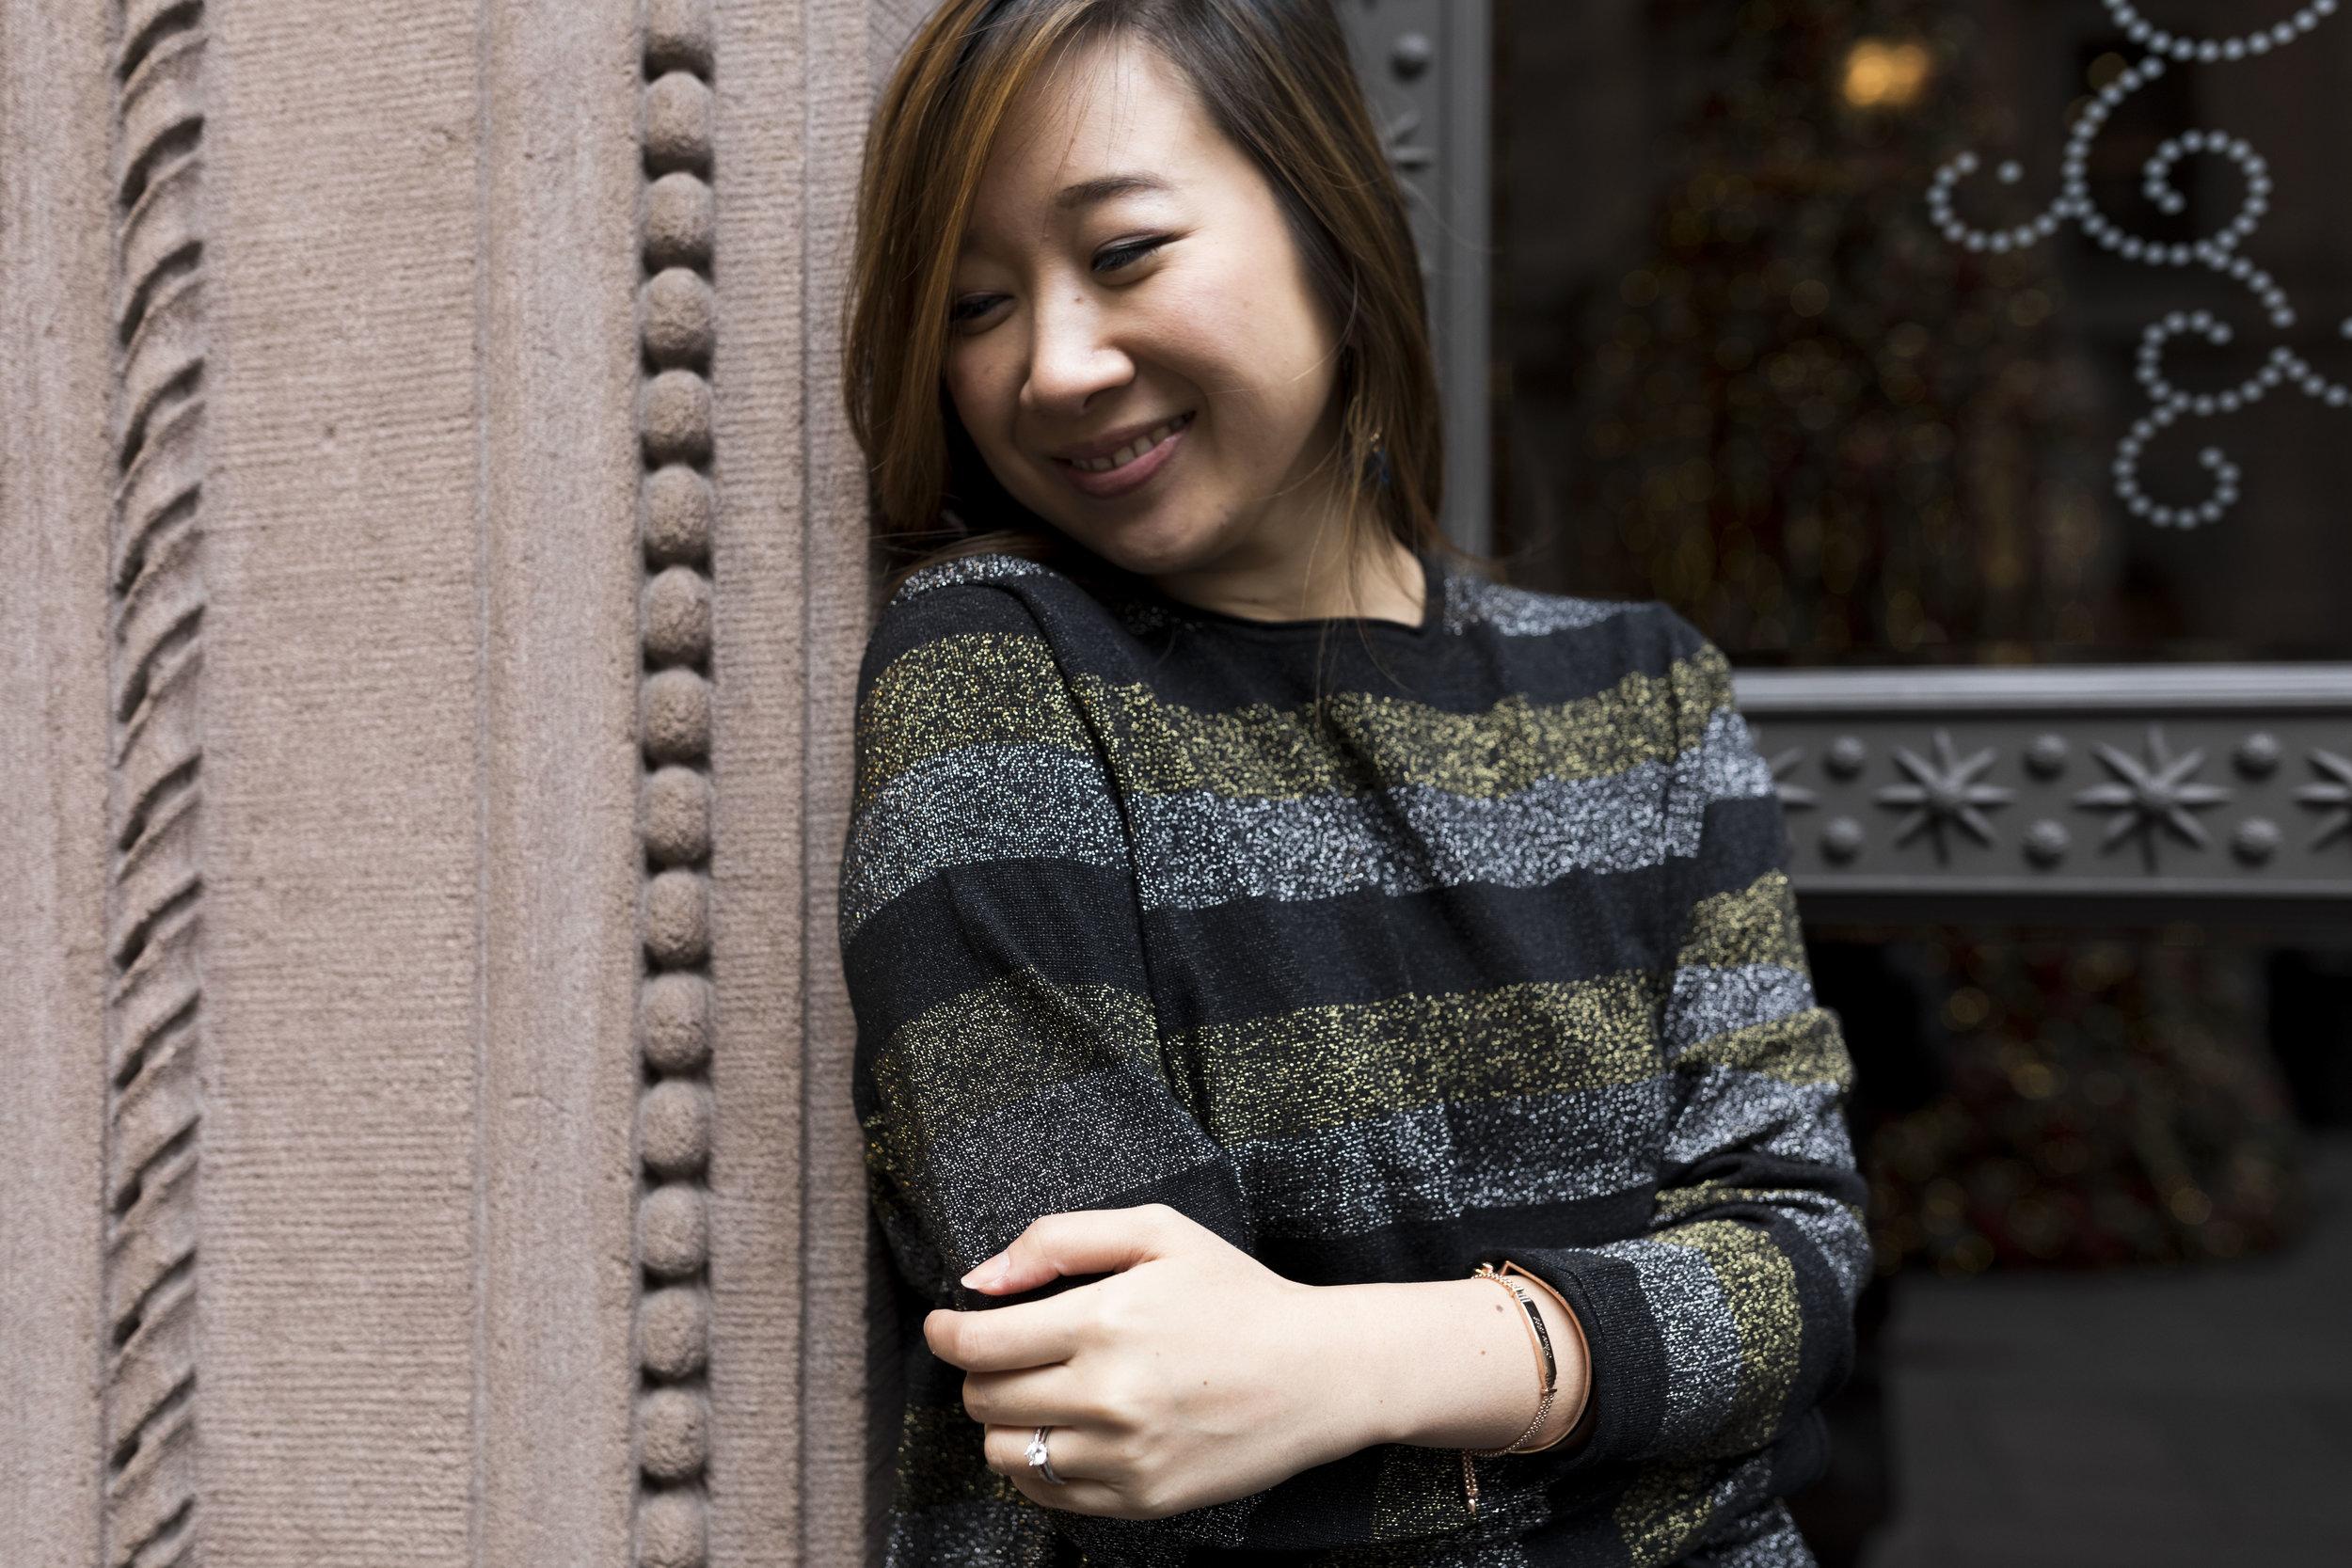 Medium Bling at 50% - This sweater says